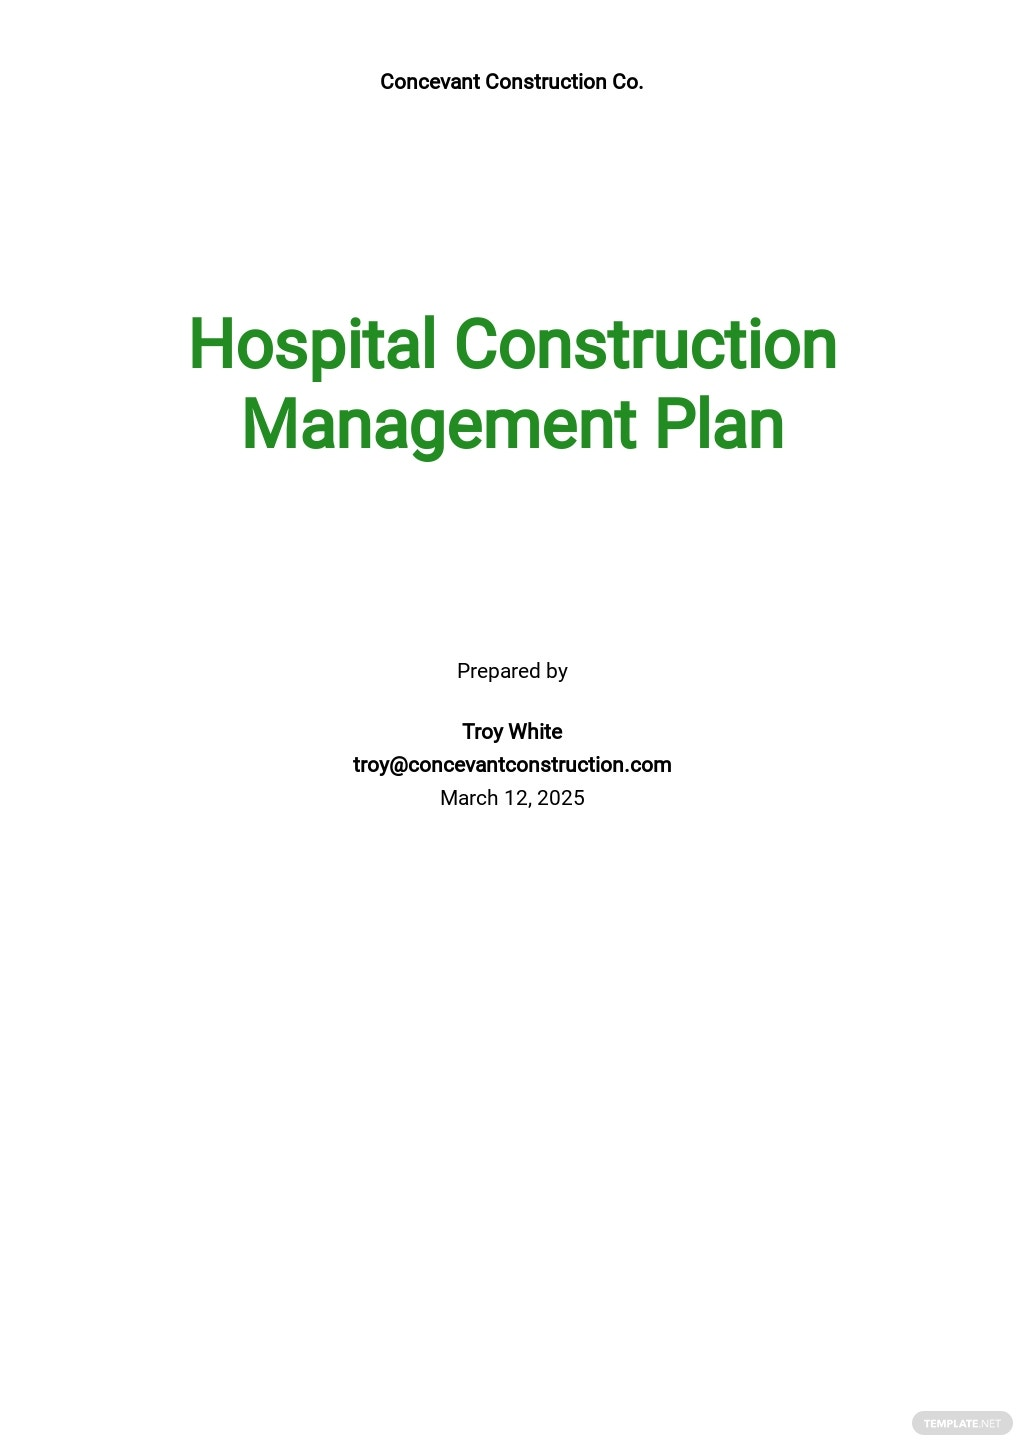 Hospital Construction Management Plan Template